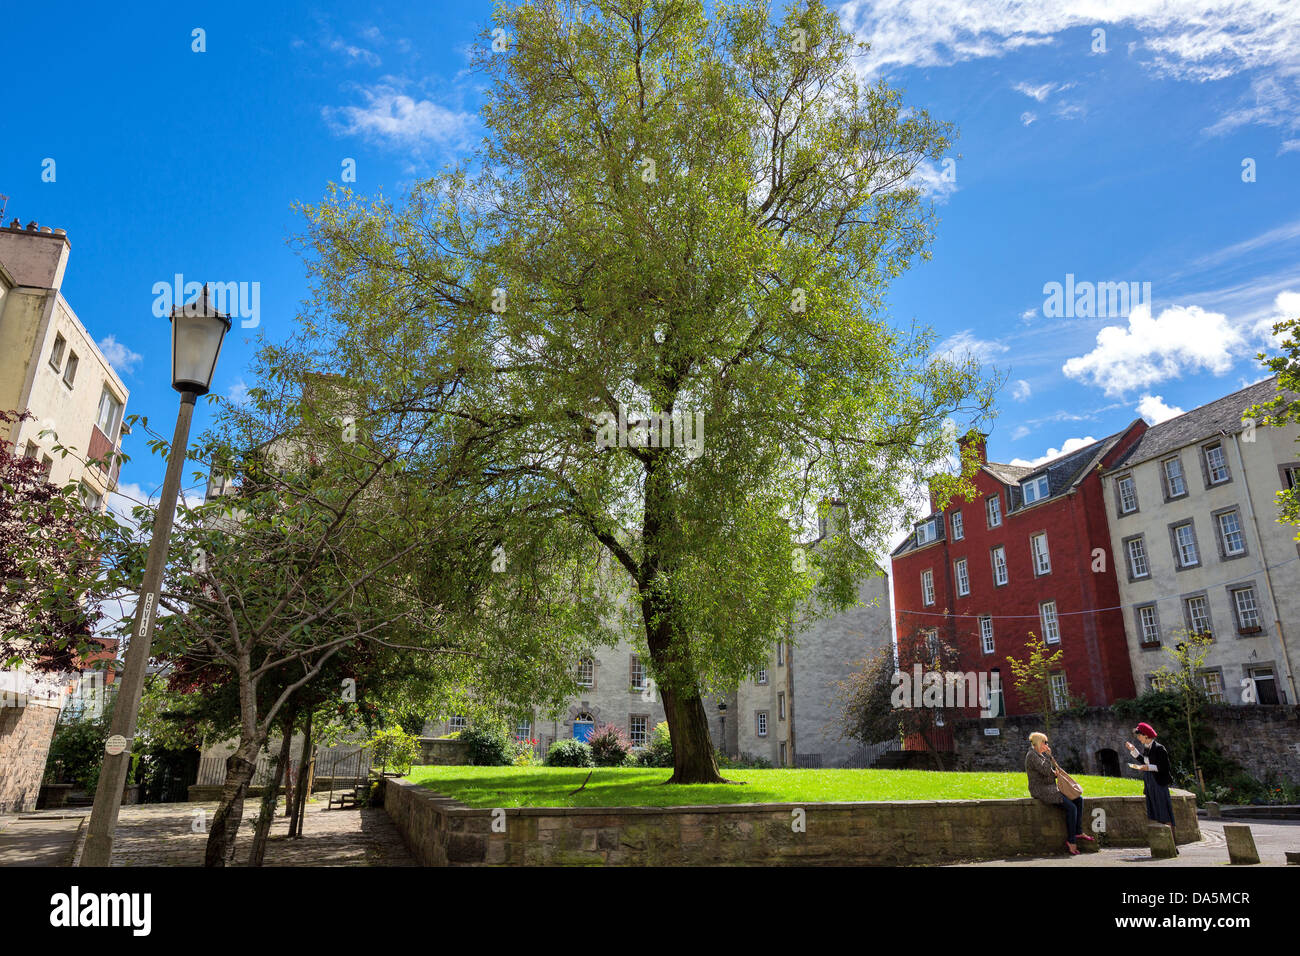 Europe Great Britain, Scotland, Edinburgh, Royal Mile, Canongate - Stock Image